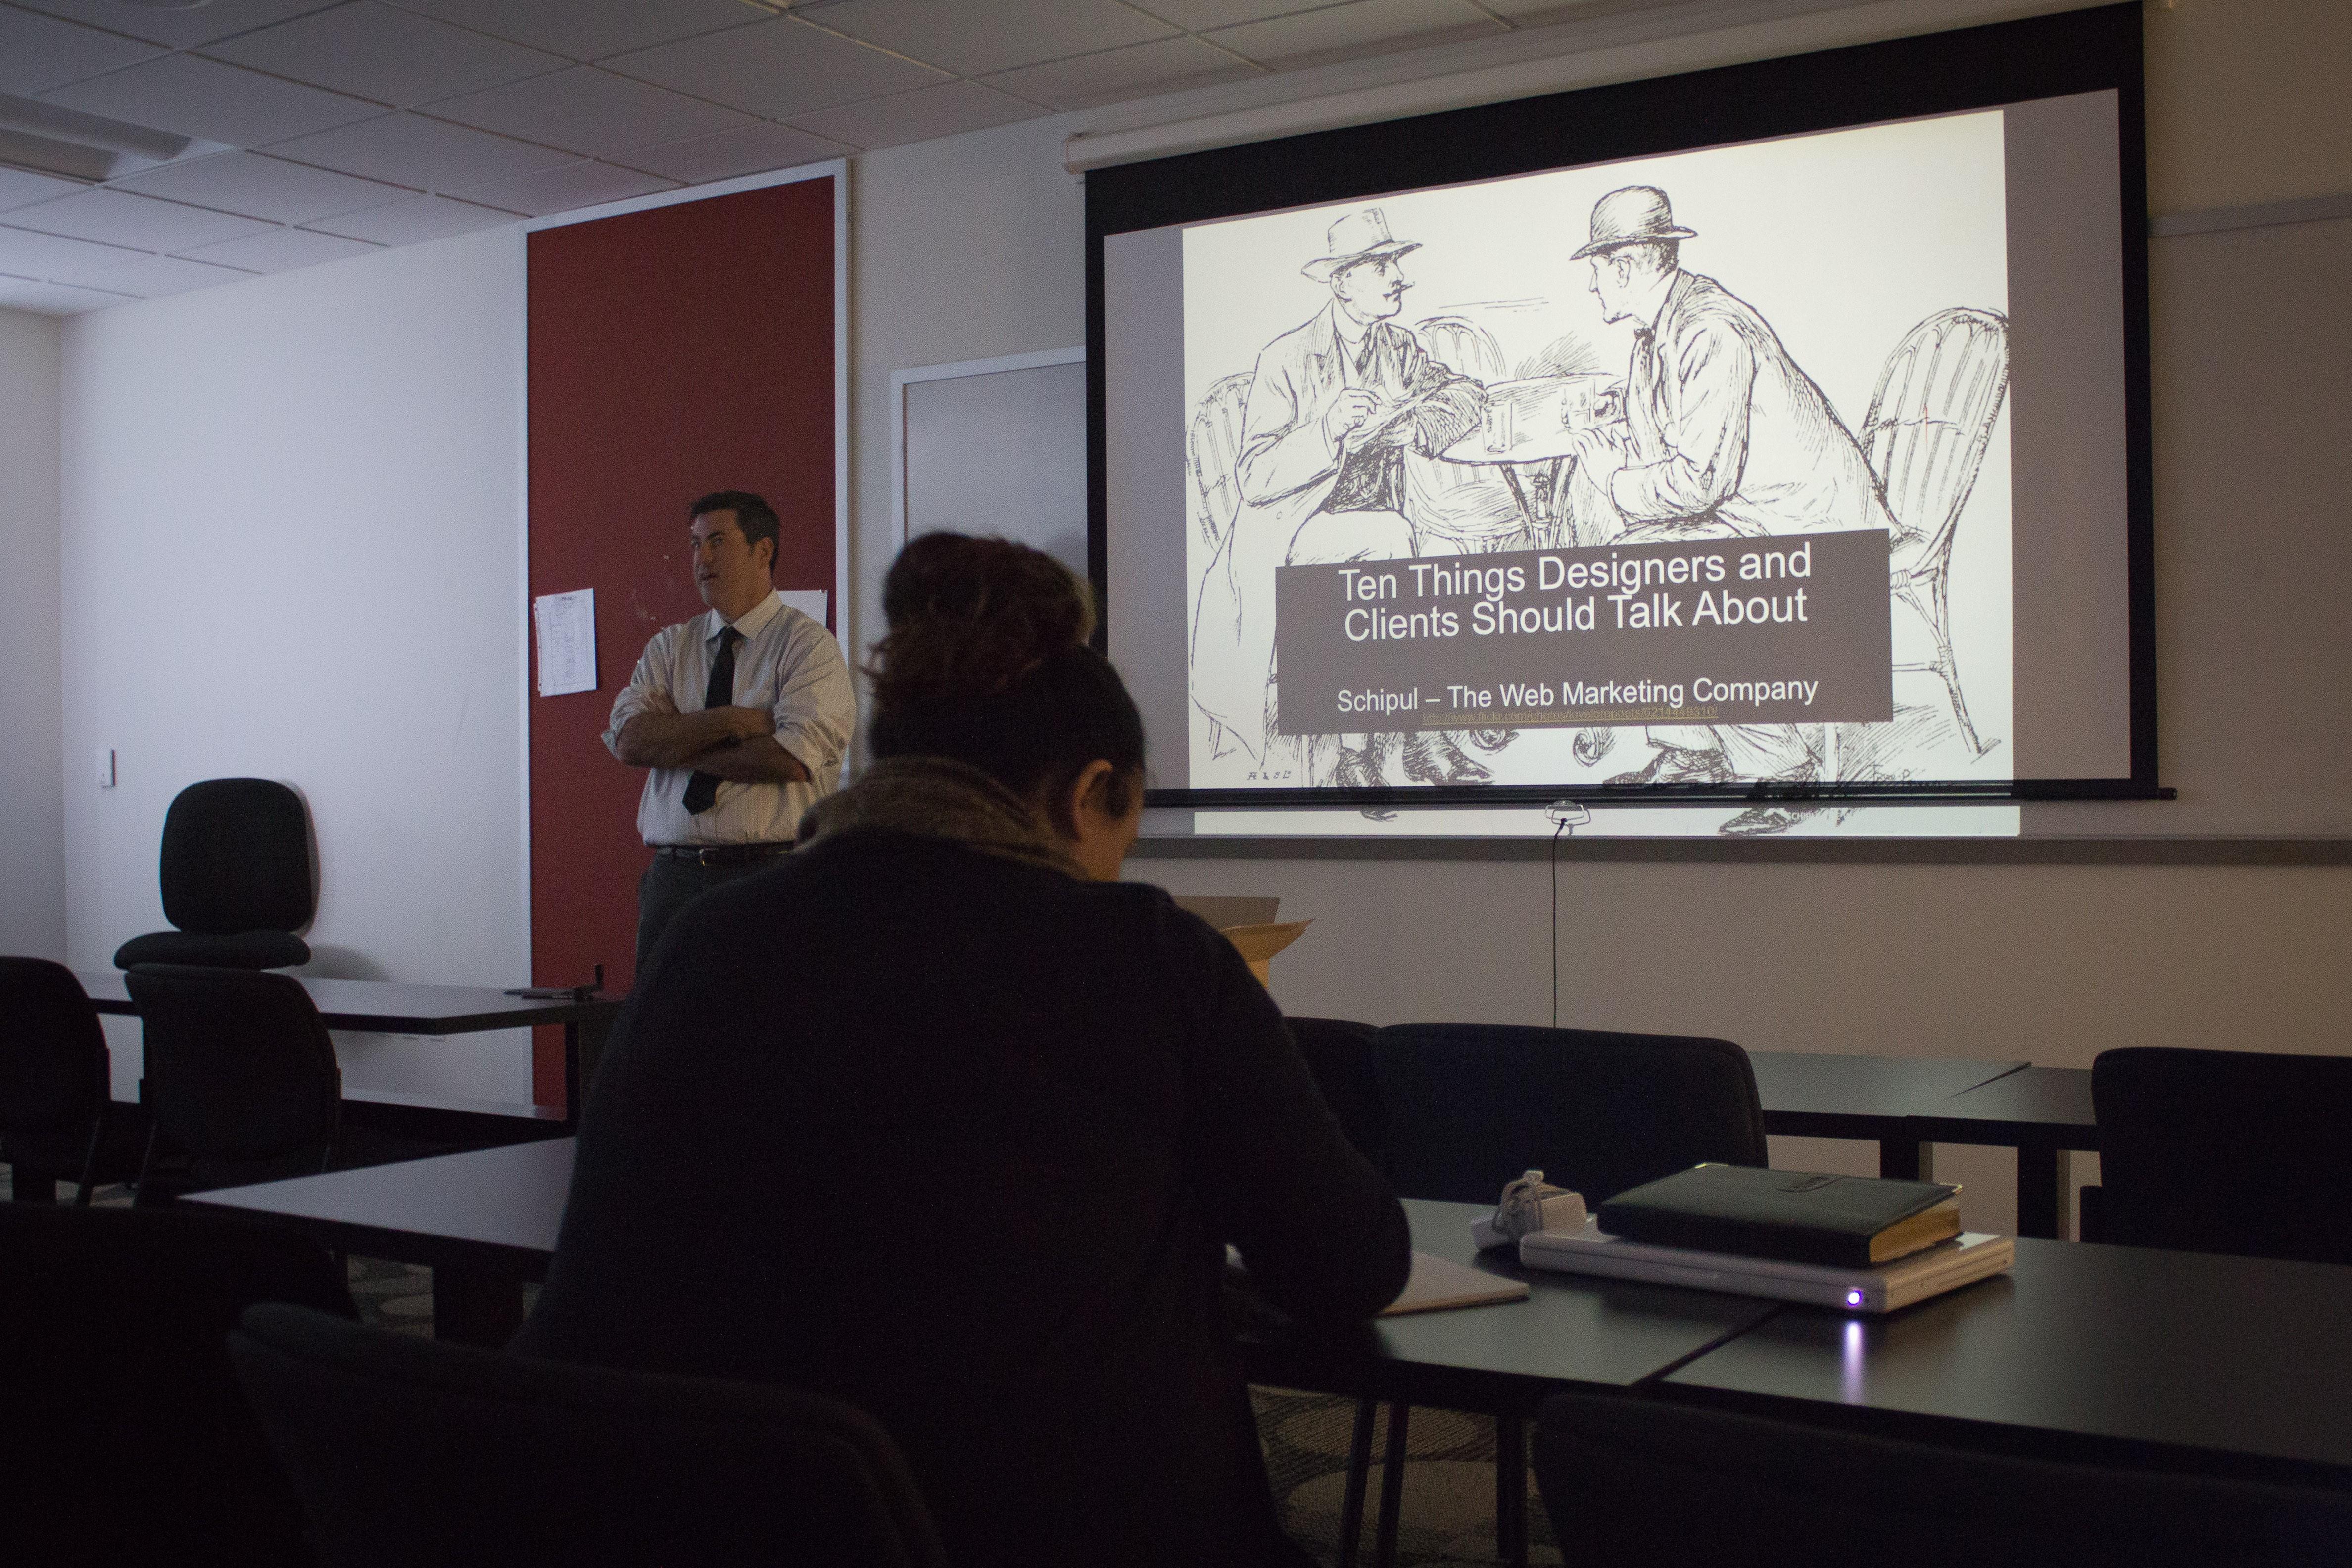 Houston Website Designers Schipul Public Speaking 2012-6